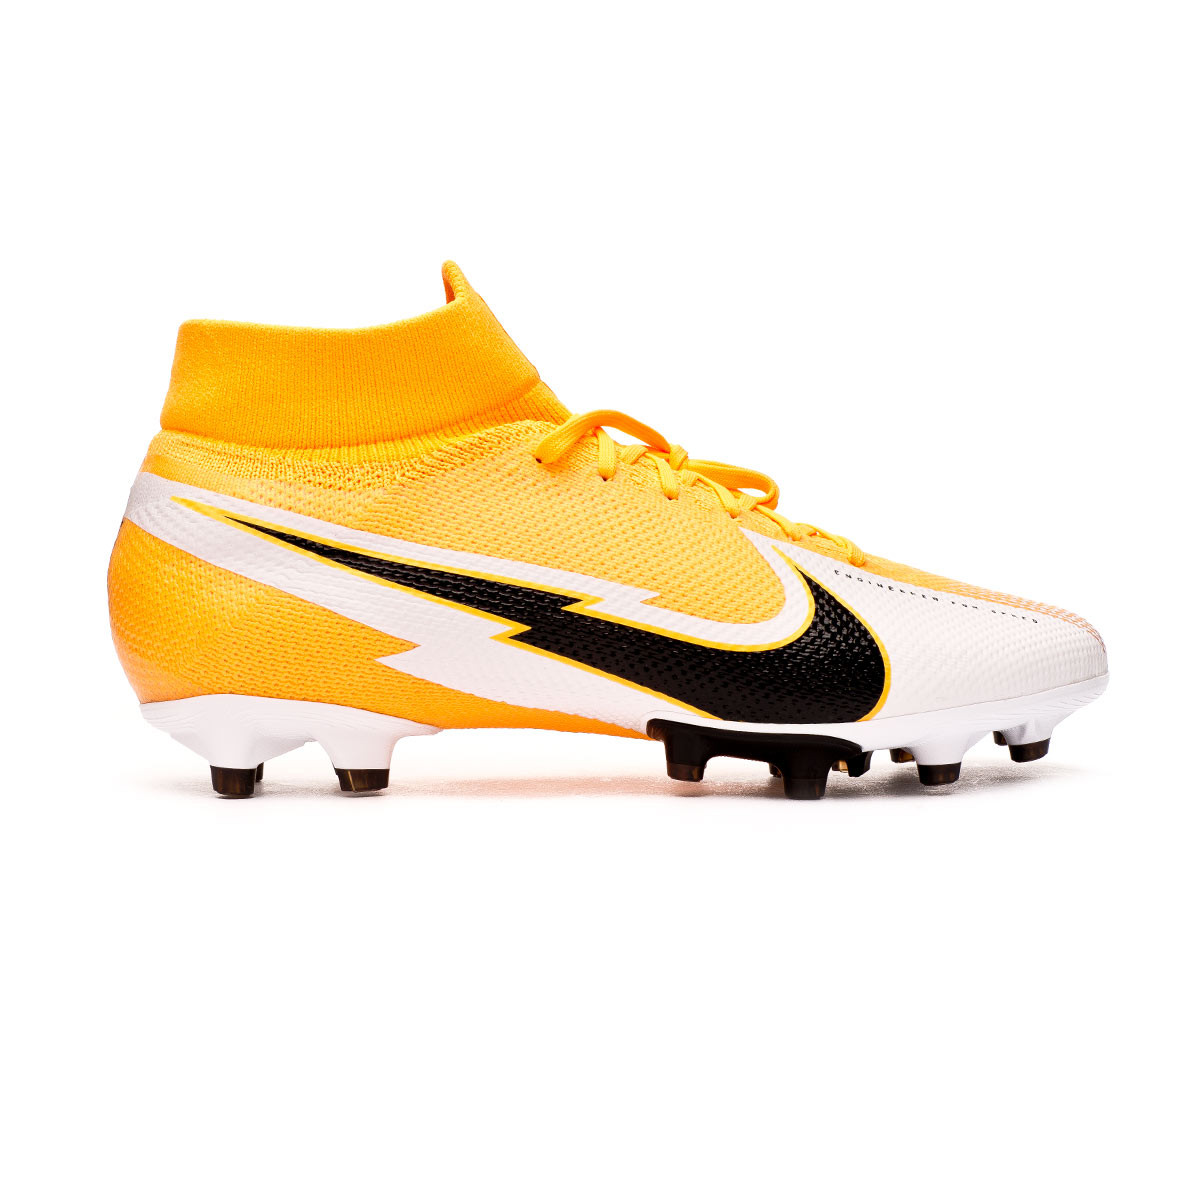 Sufijo eficacia Canguro  Bota de fútbol Nike Mercurial Superfly VII Pro AG-PRO Laser  orange-Black-White-Laser orange - Tienda de fútbol Fútbol Emotion